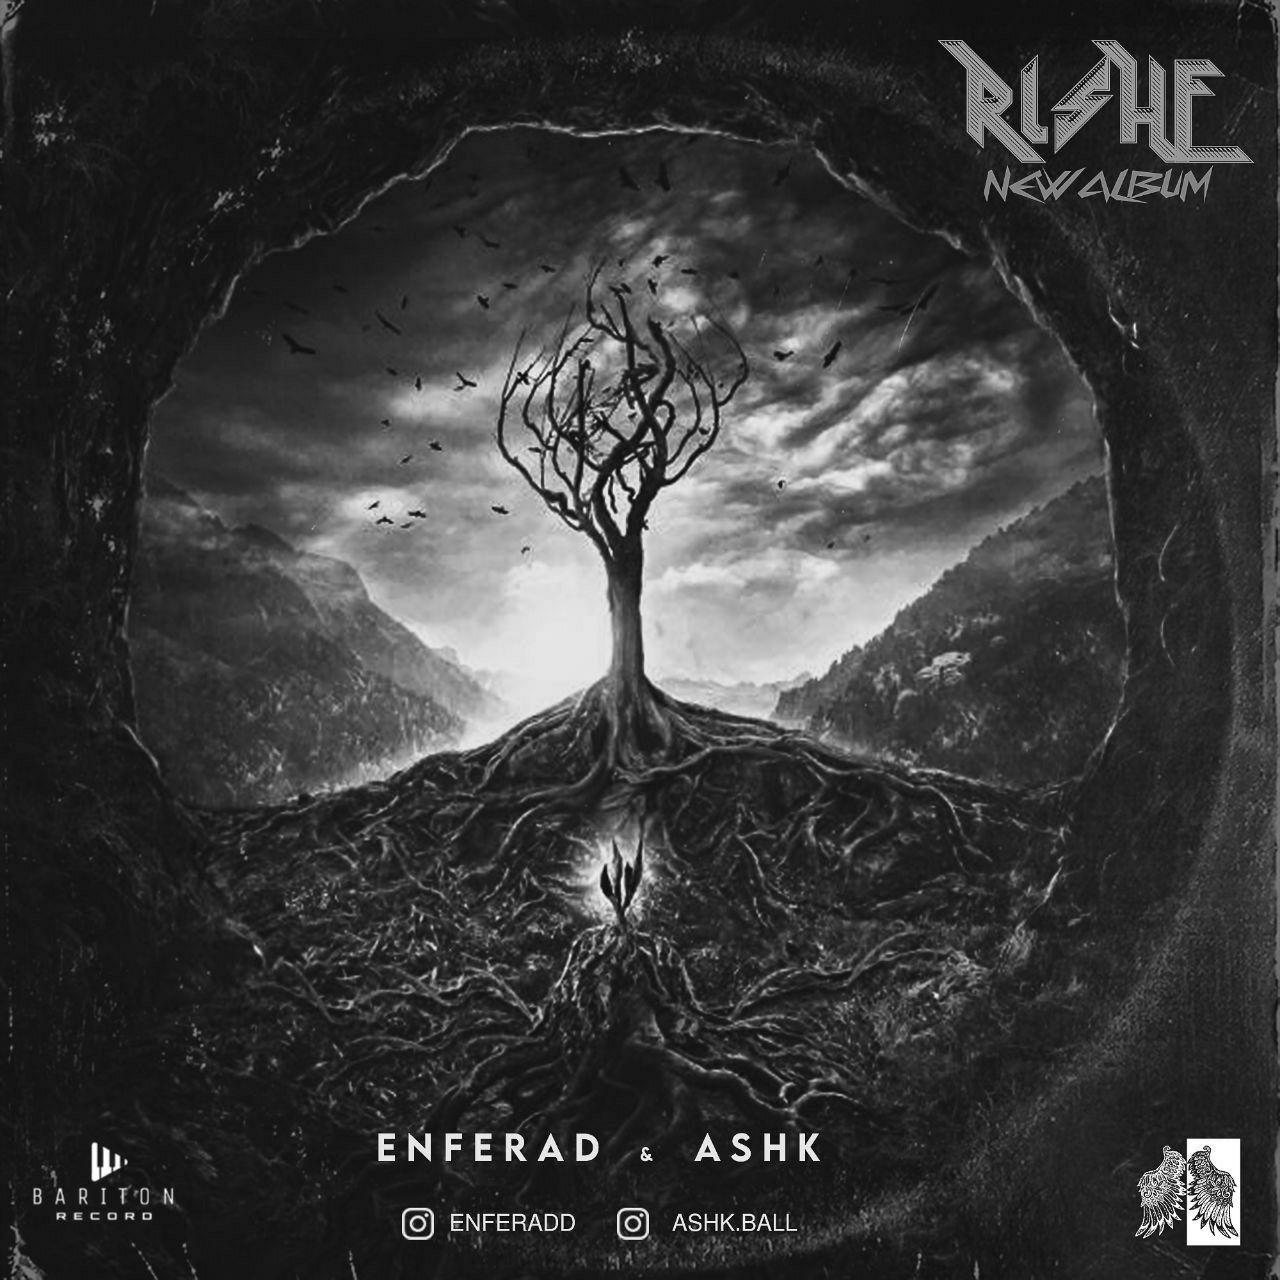 Enferad & Ashk - Rishe Album